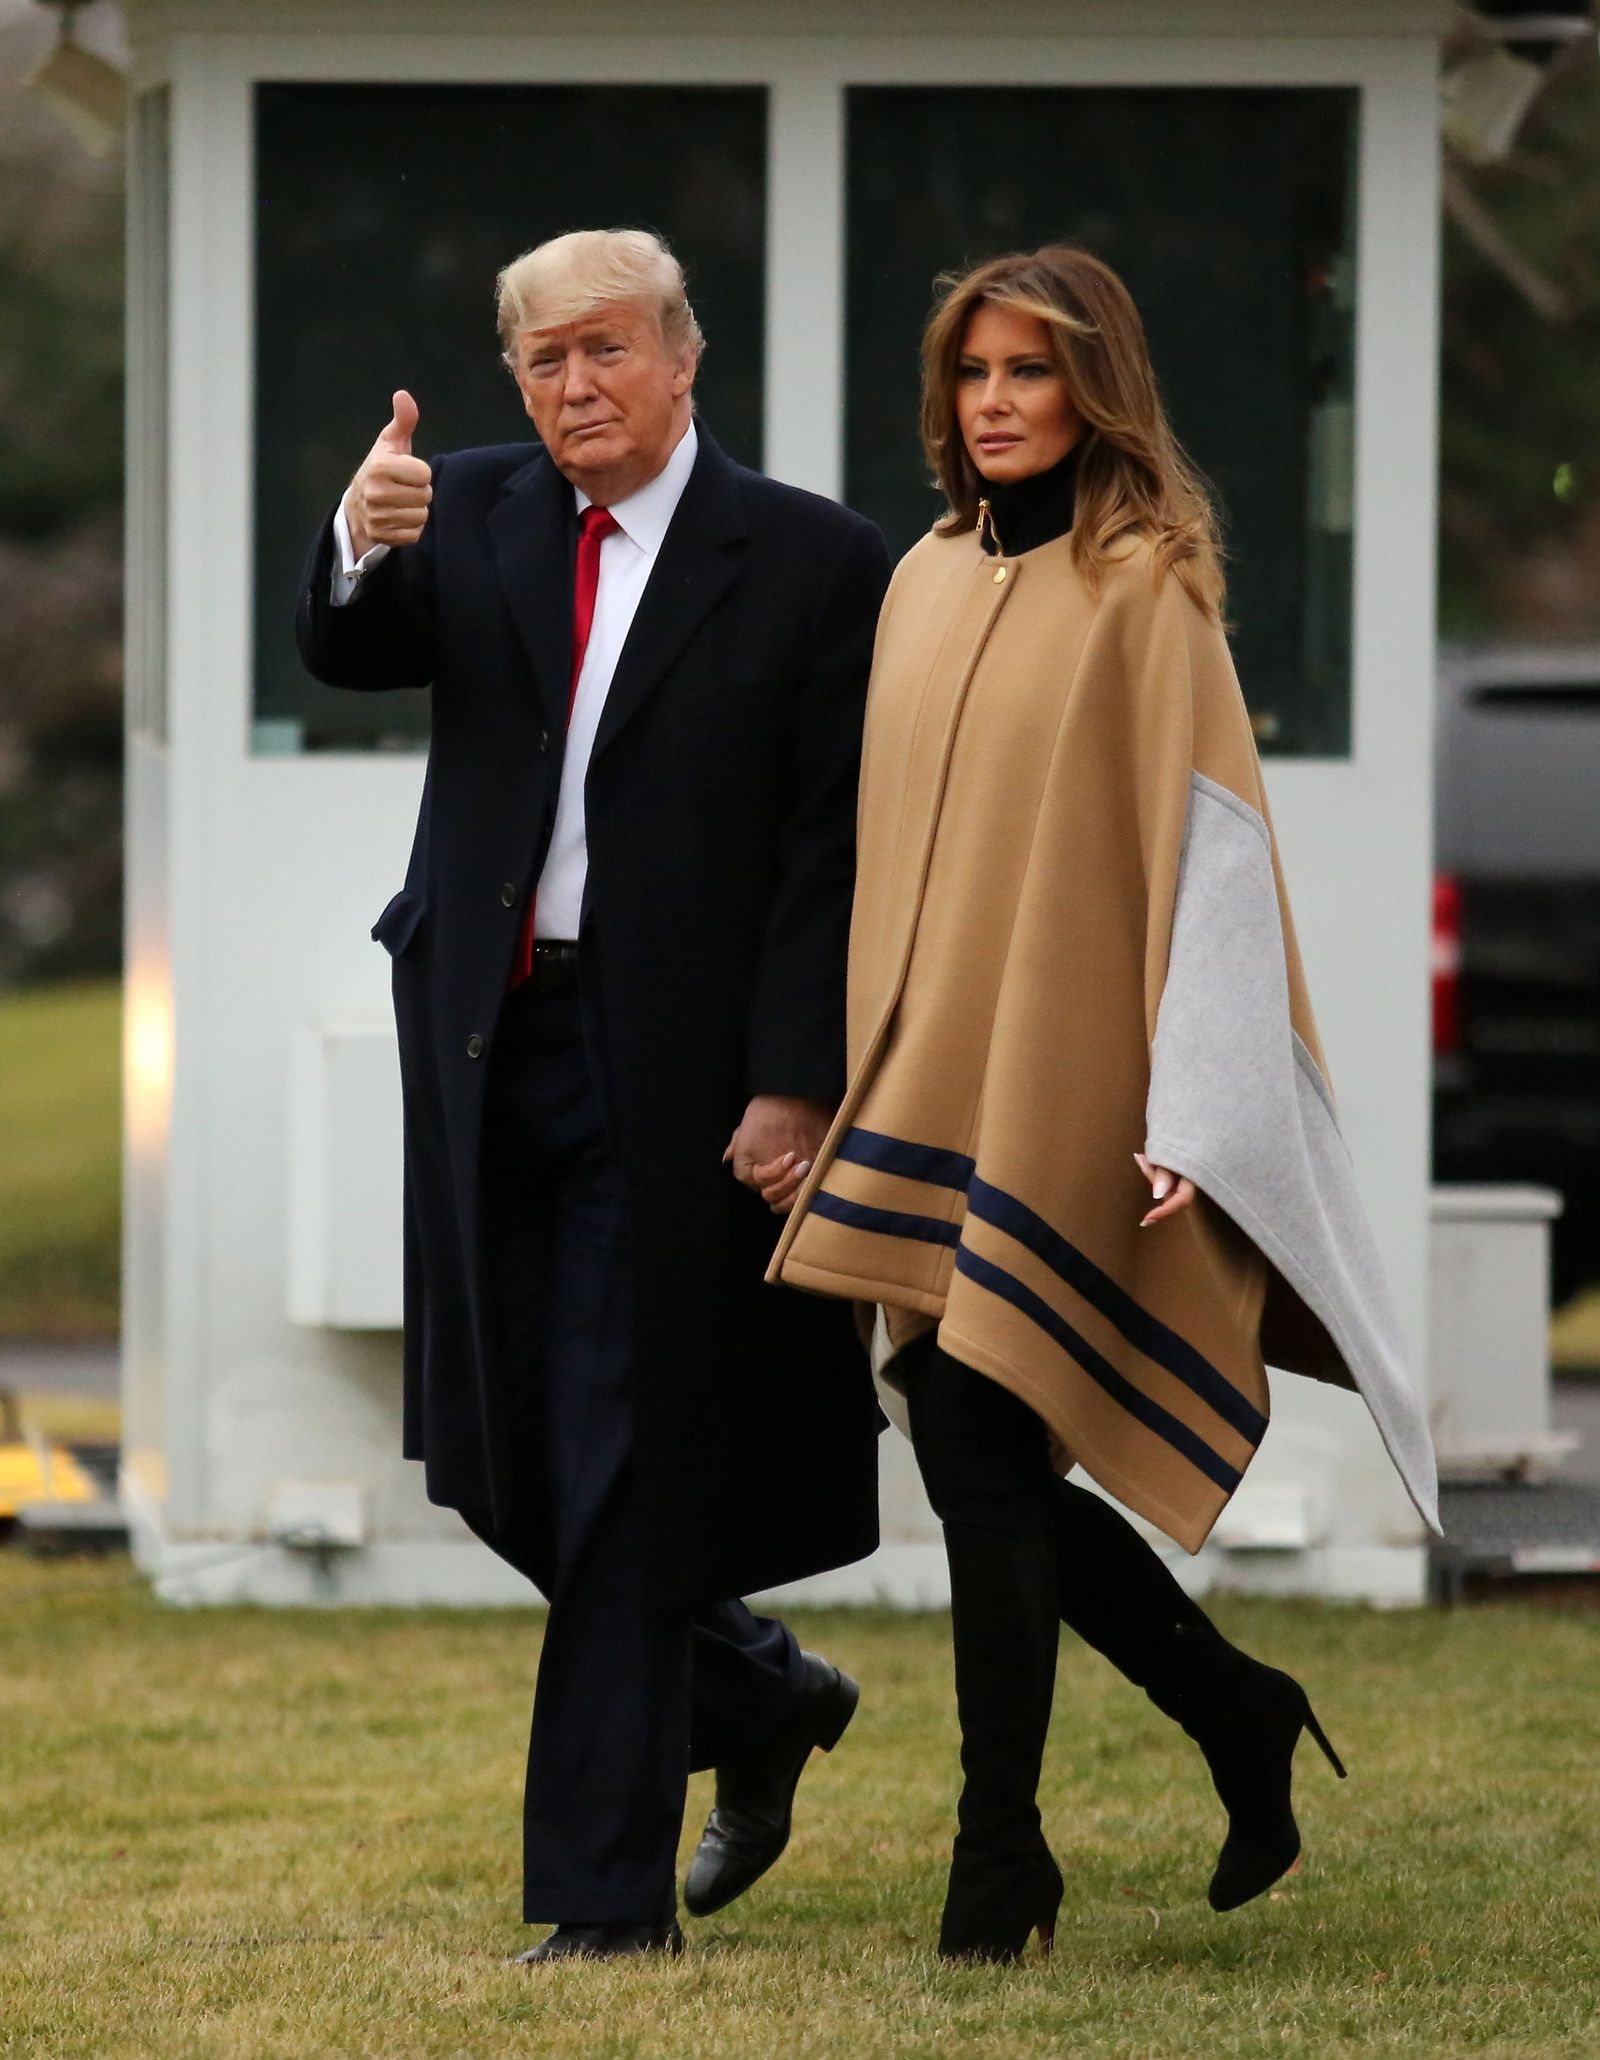 Donald and Melania Trump depart the White House, Washington, USA - 31 Jan 2020